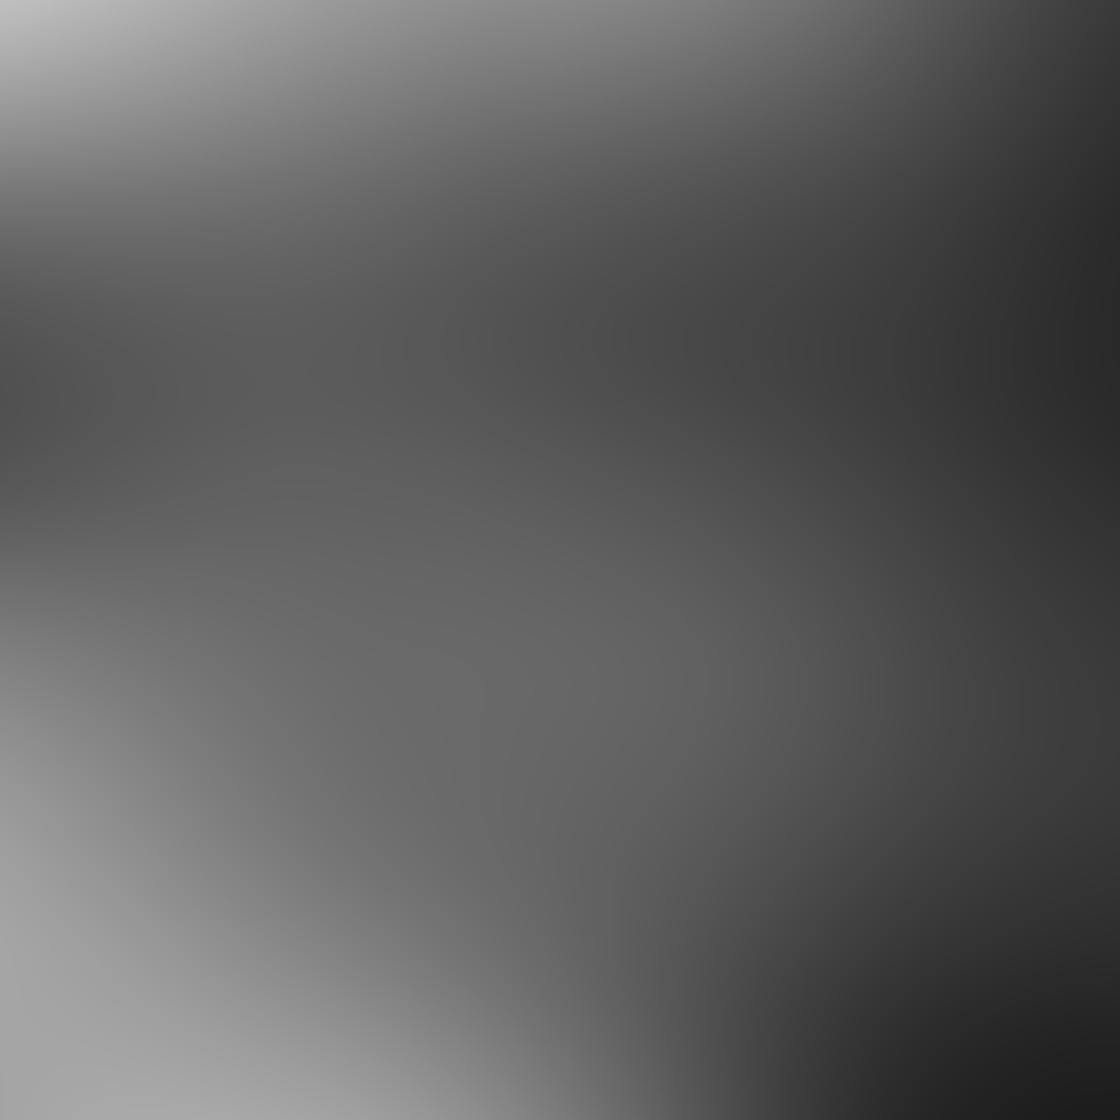 iPhone Long Exposure 3